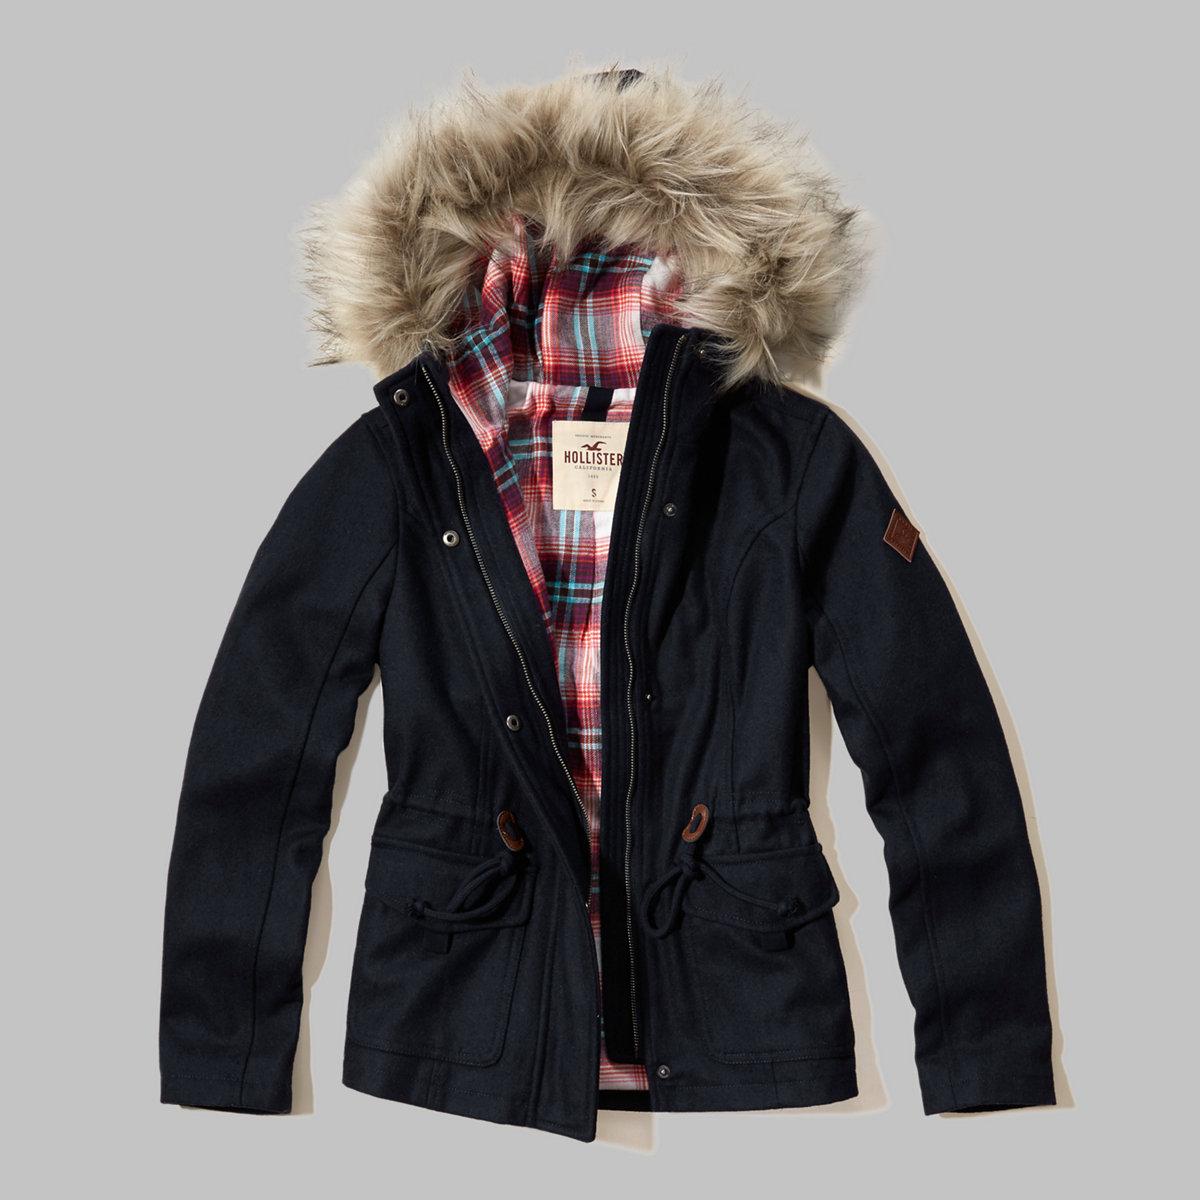 Wool Anorak Jacket